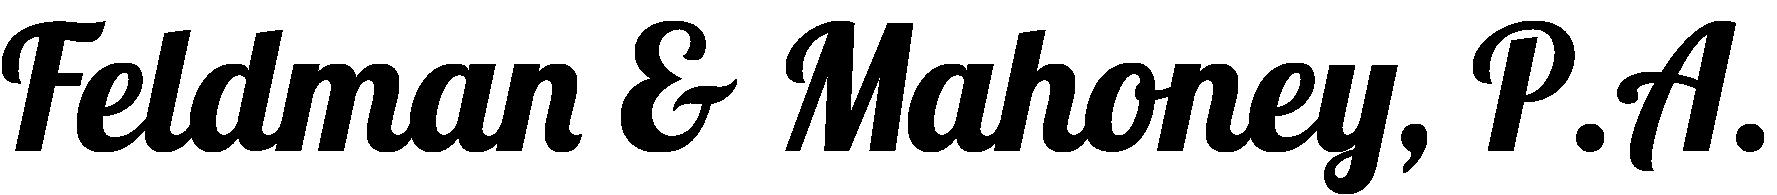 Hole Sponsors - Feldman & Mahoney P.A. - Logo